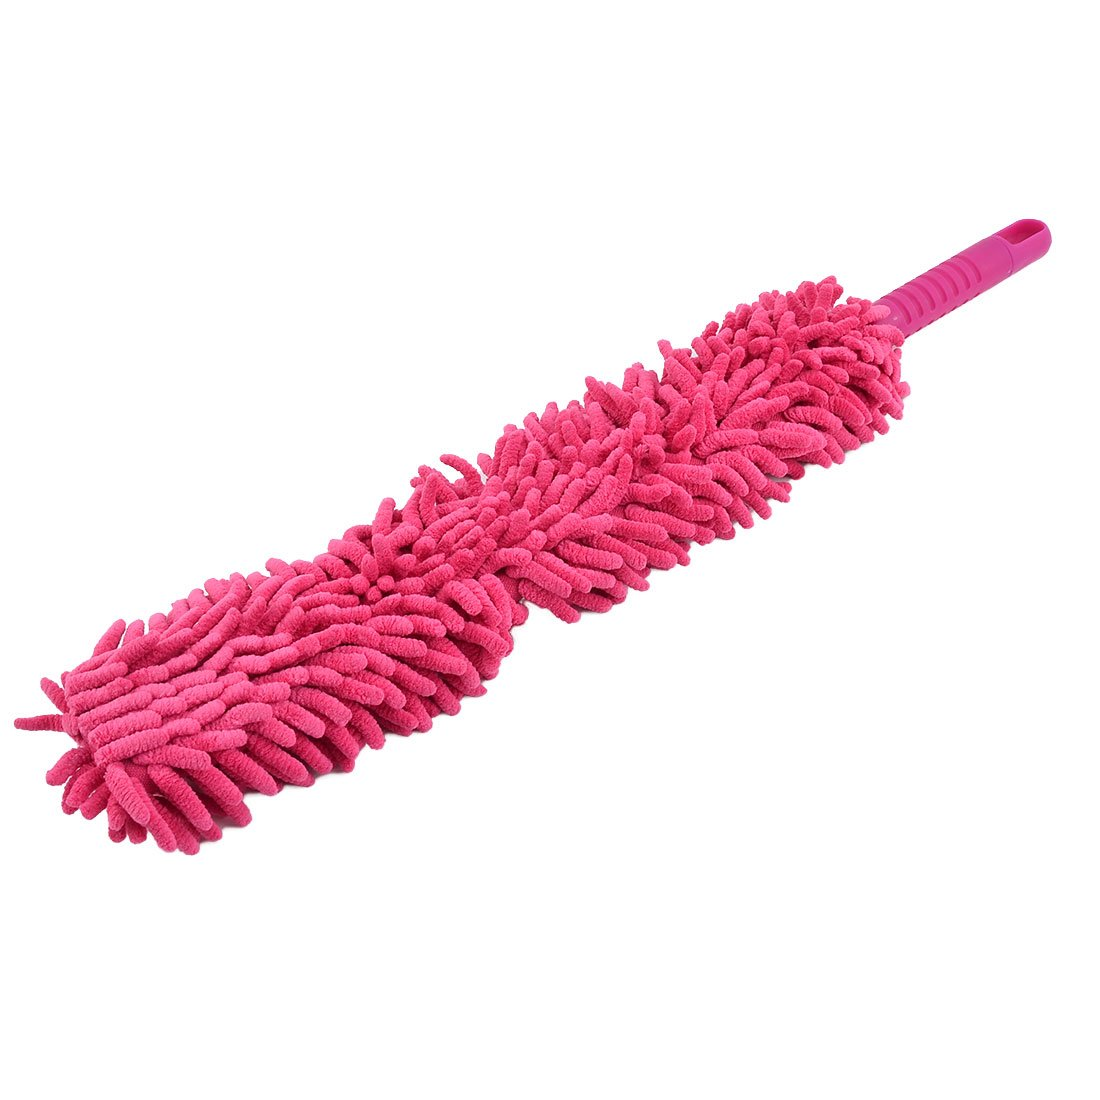 uxcell Plastic Handle Home Detachable Bookshelf Window Car Dirt Clean Brush Duster Fuchsia